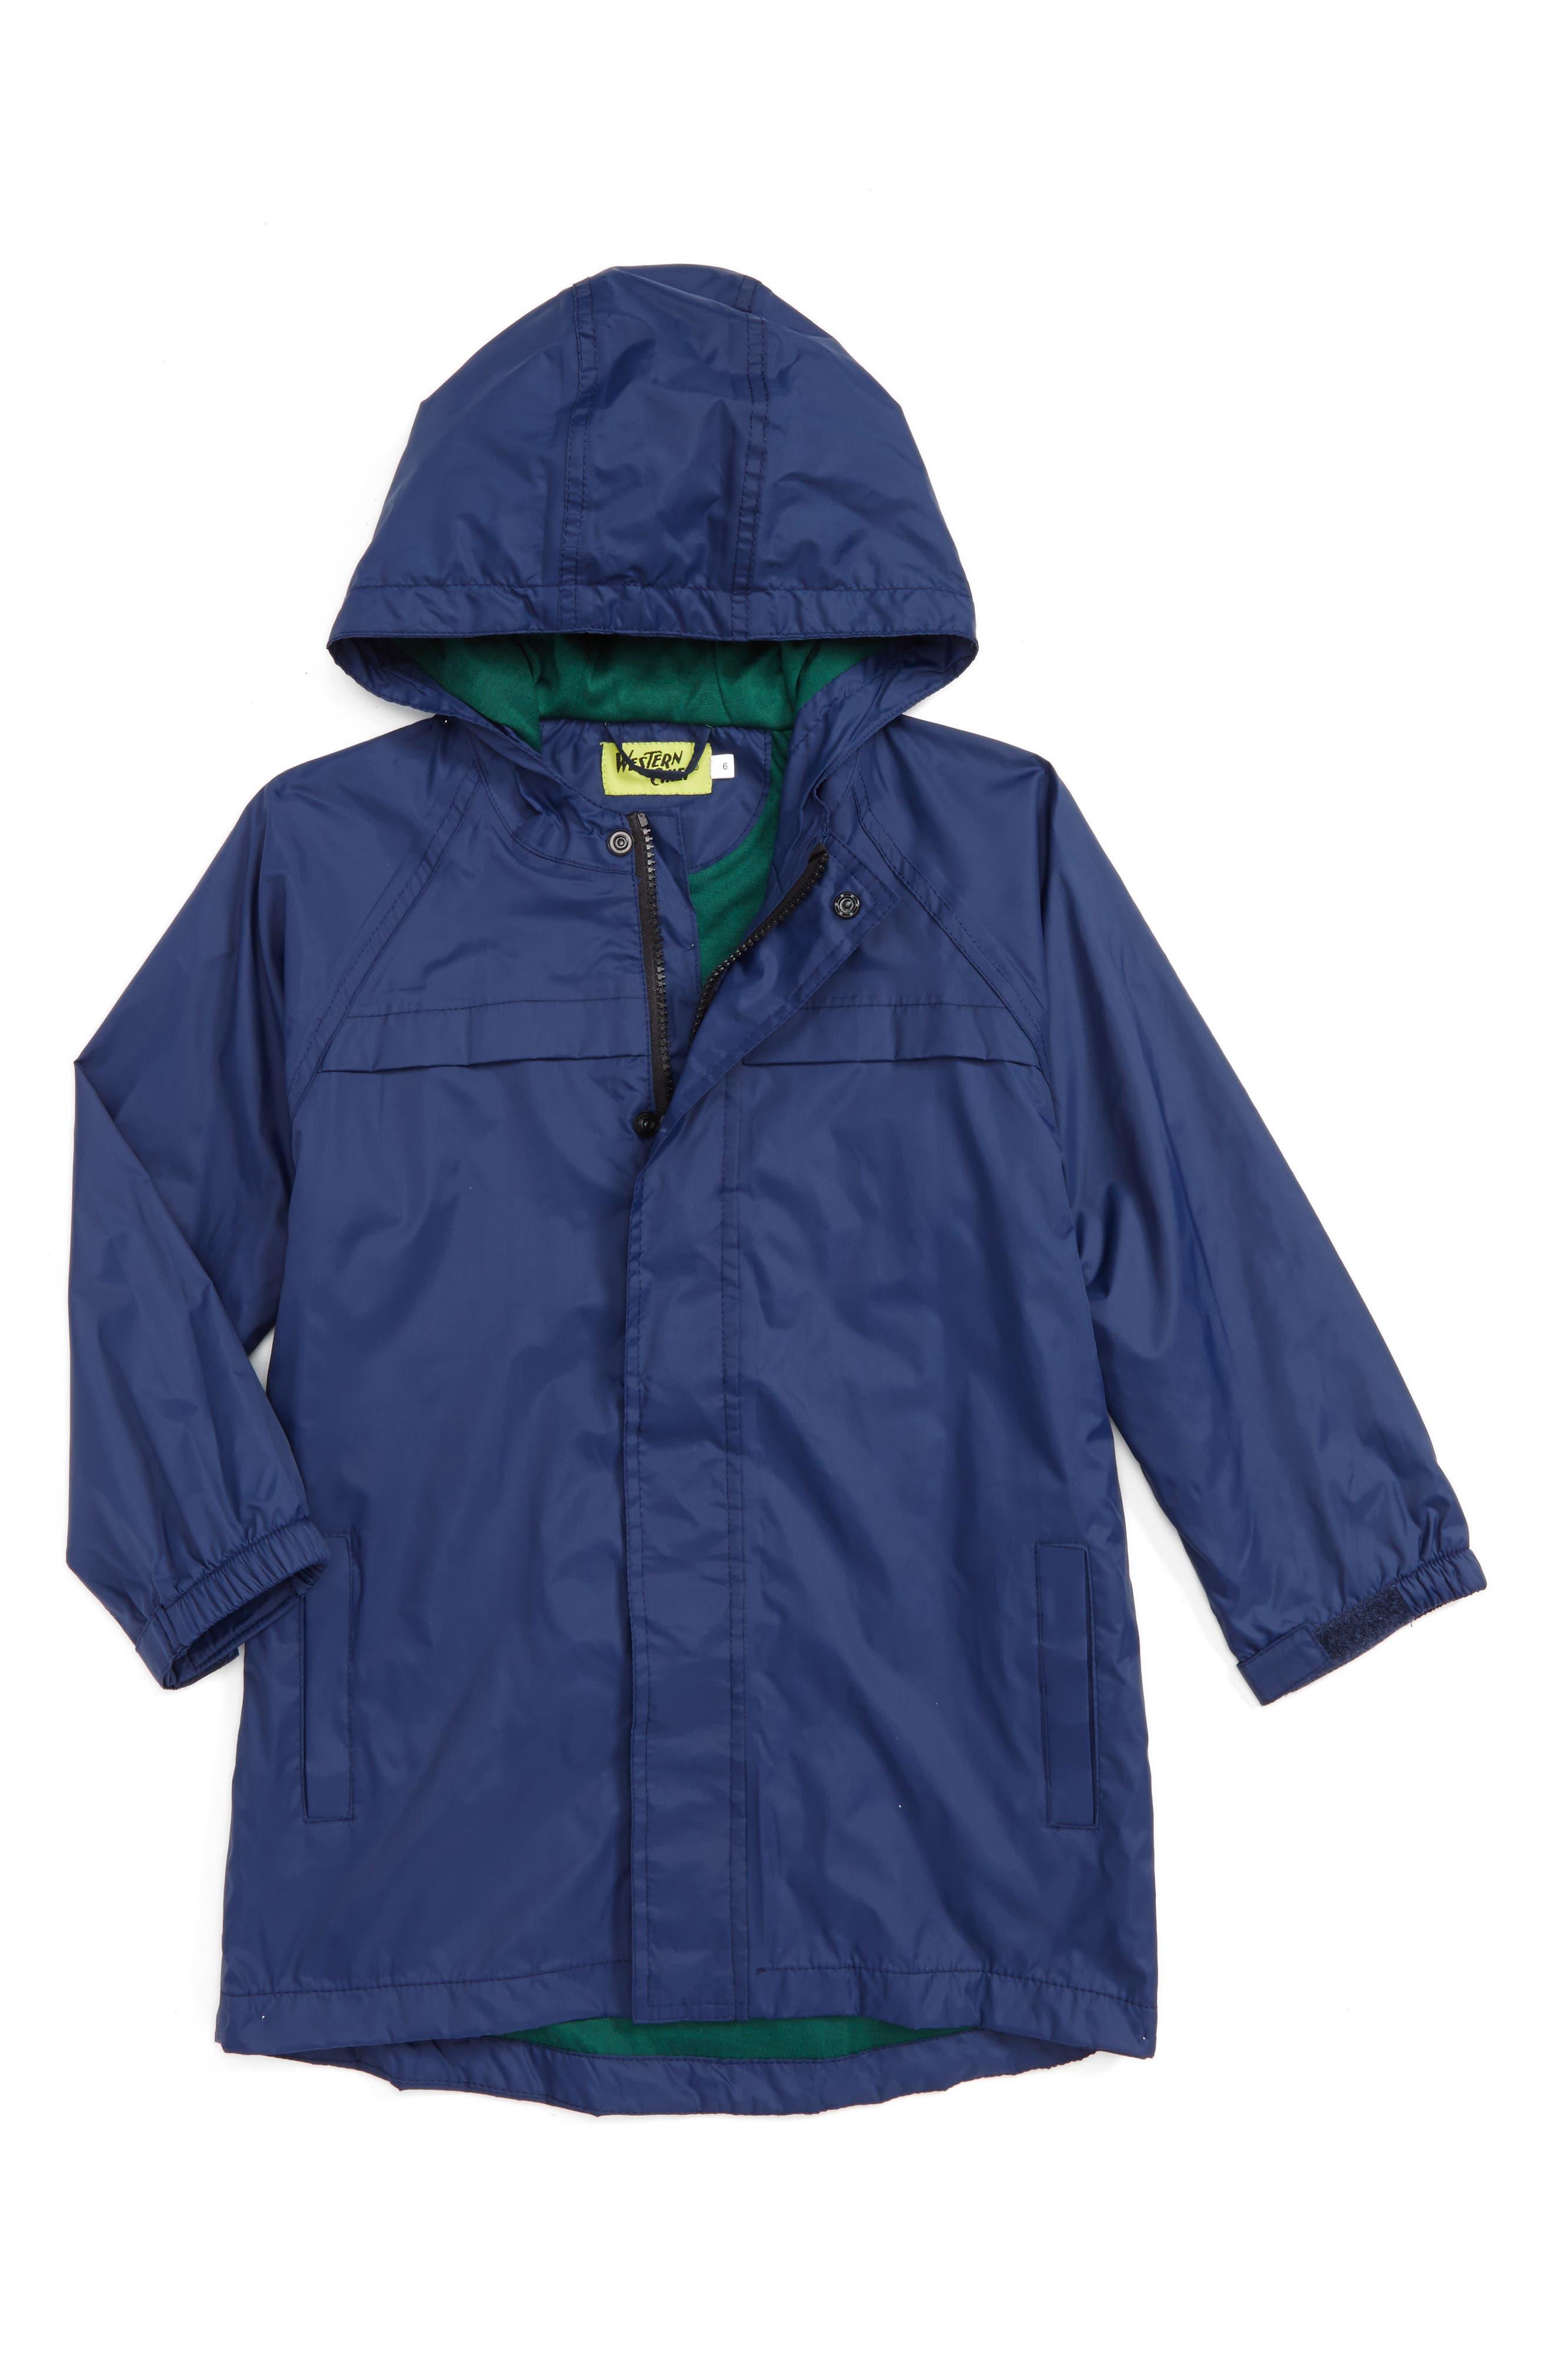 Alternate Image 1 Selected - Western Chief Raincoat (Toddler, Little Kid & Big Kid)